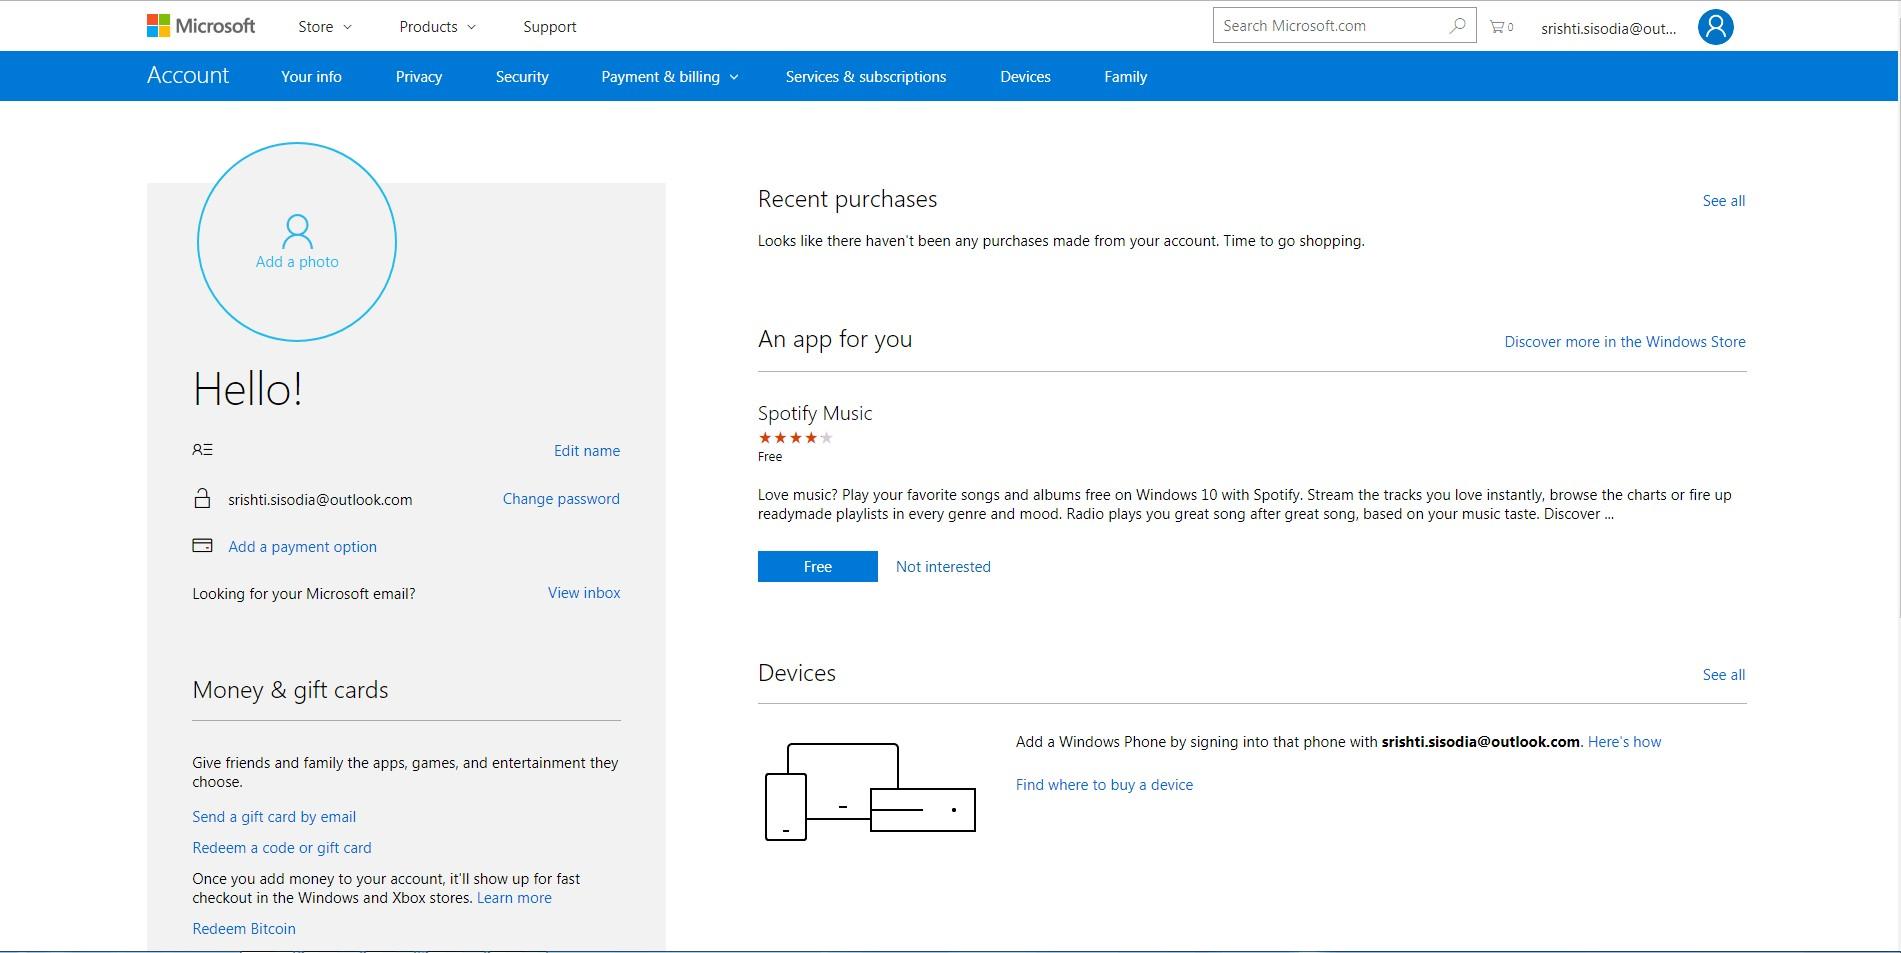 Microsoft account home page